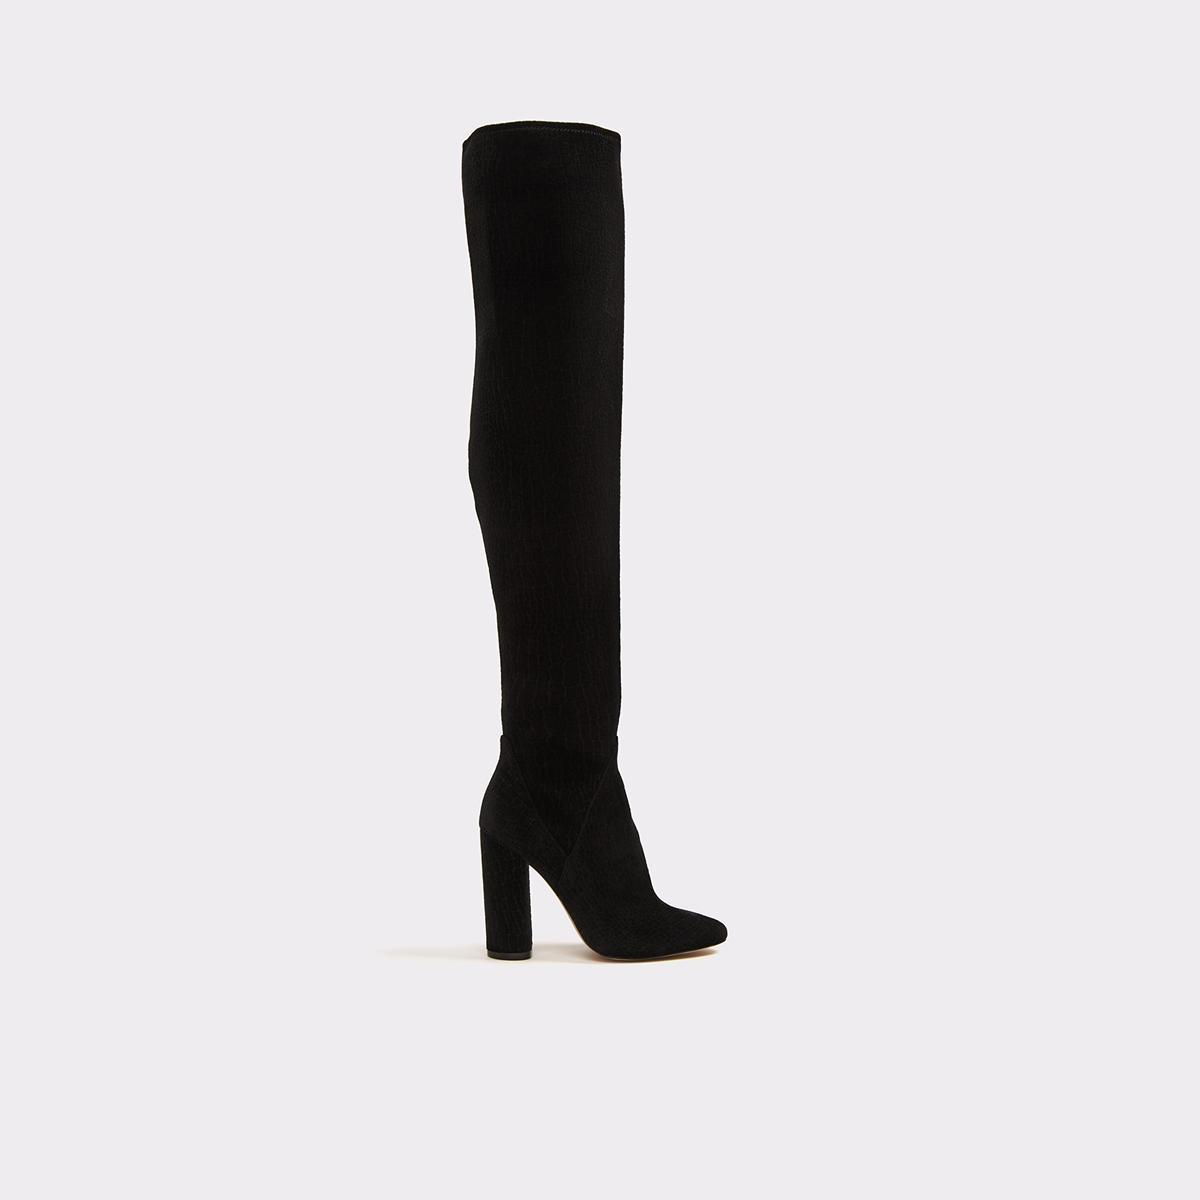 133e577c780 Tenesha Black Women's Boots   Aldoshoes.com US